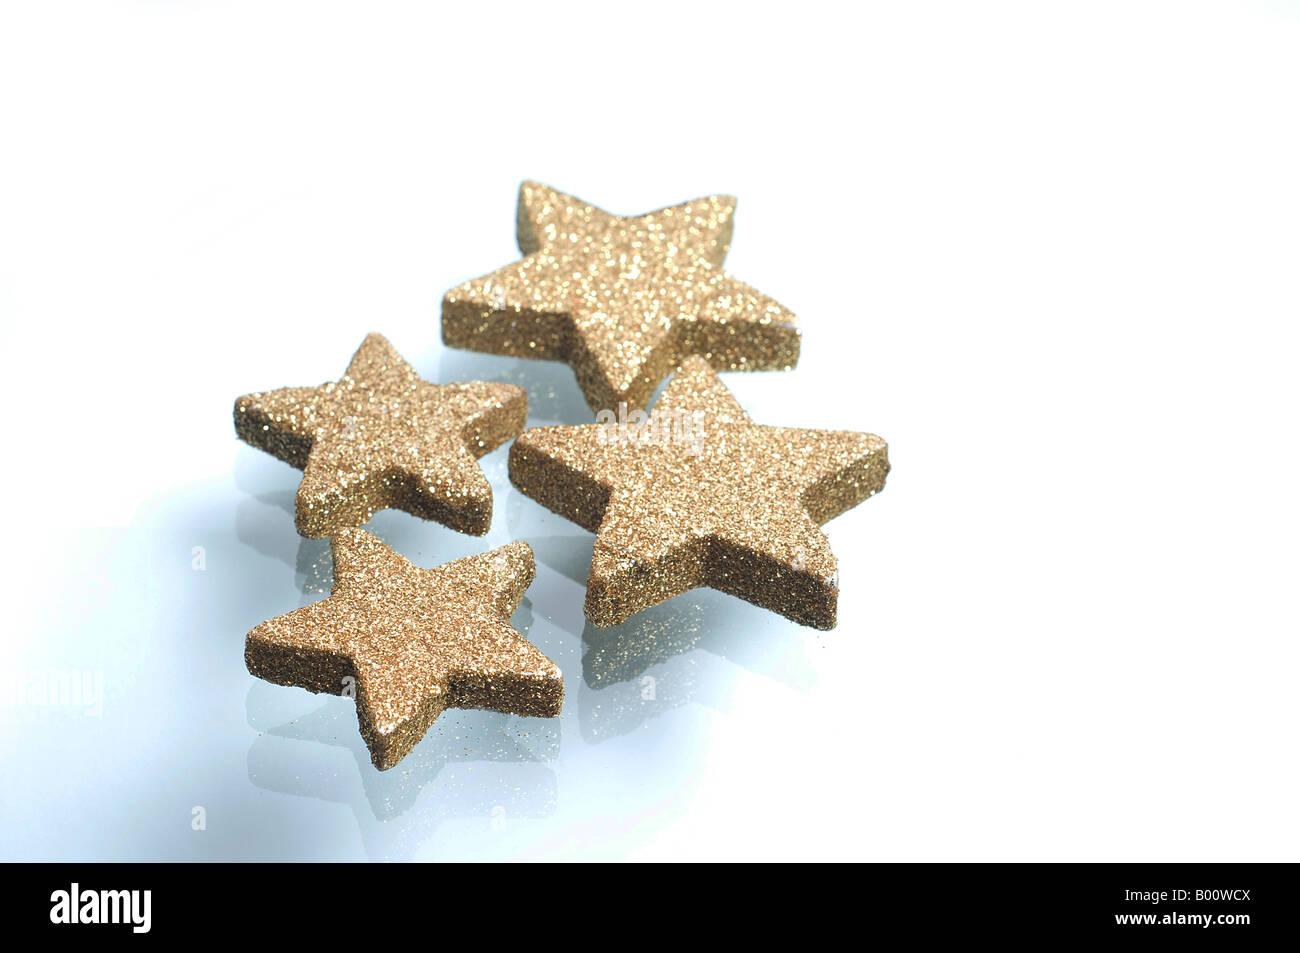 asterisks;stars - Stock Image